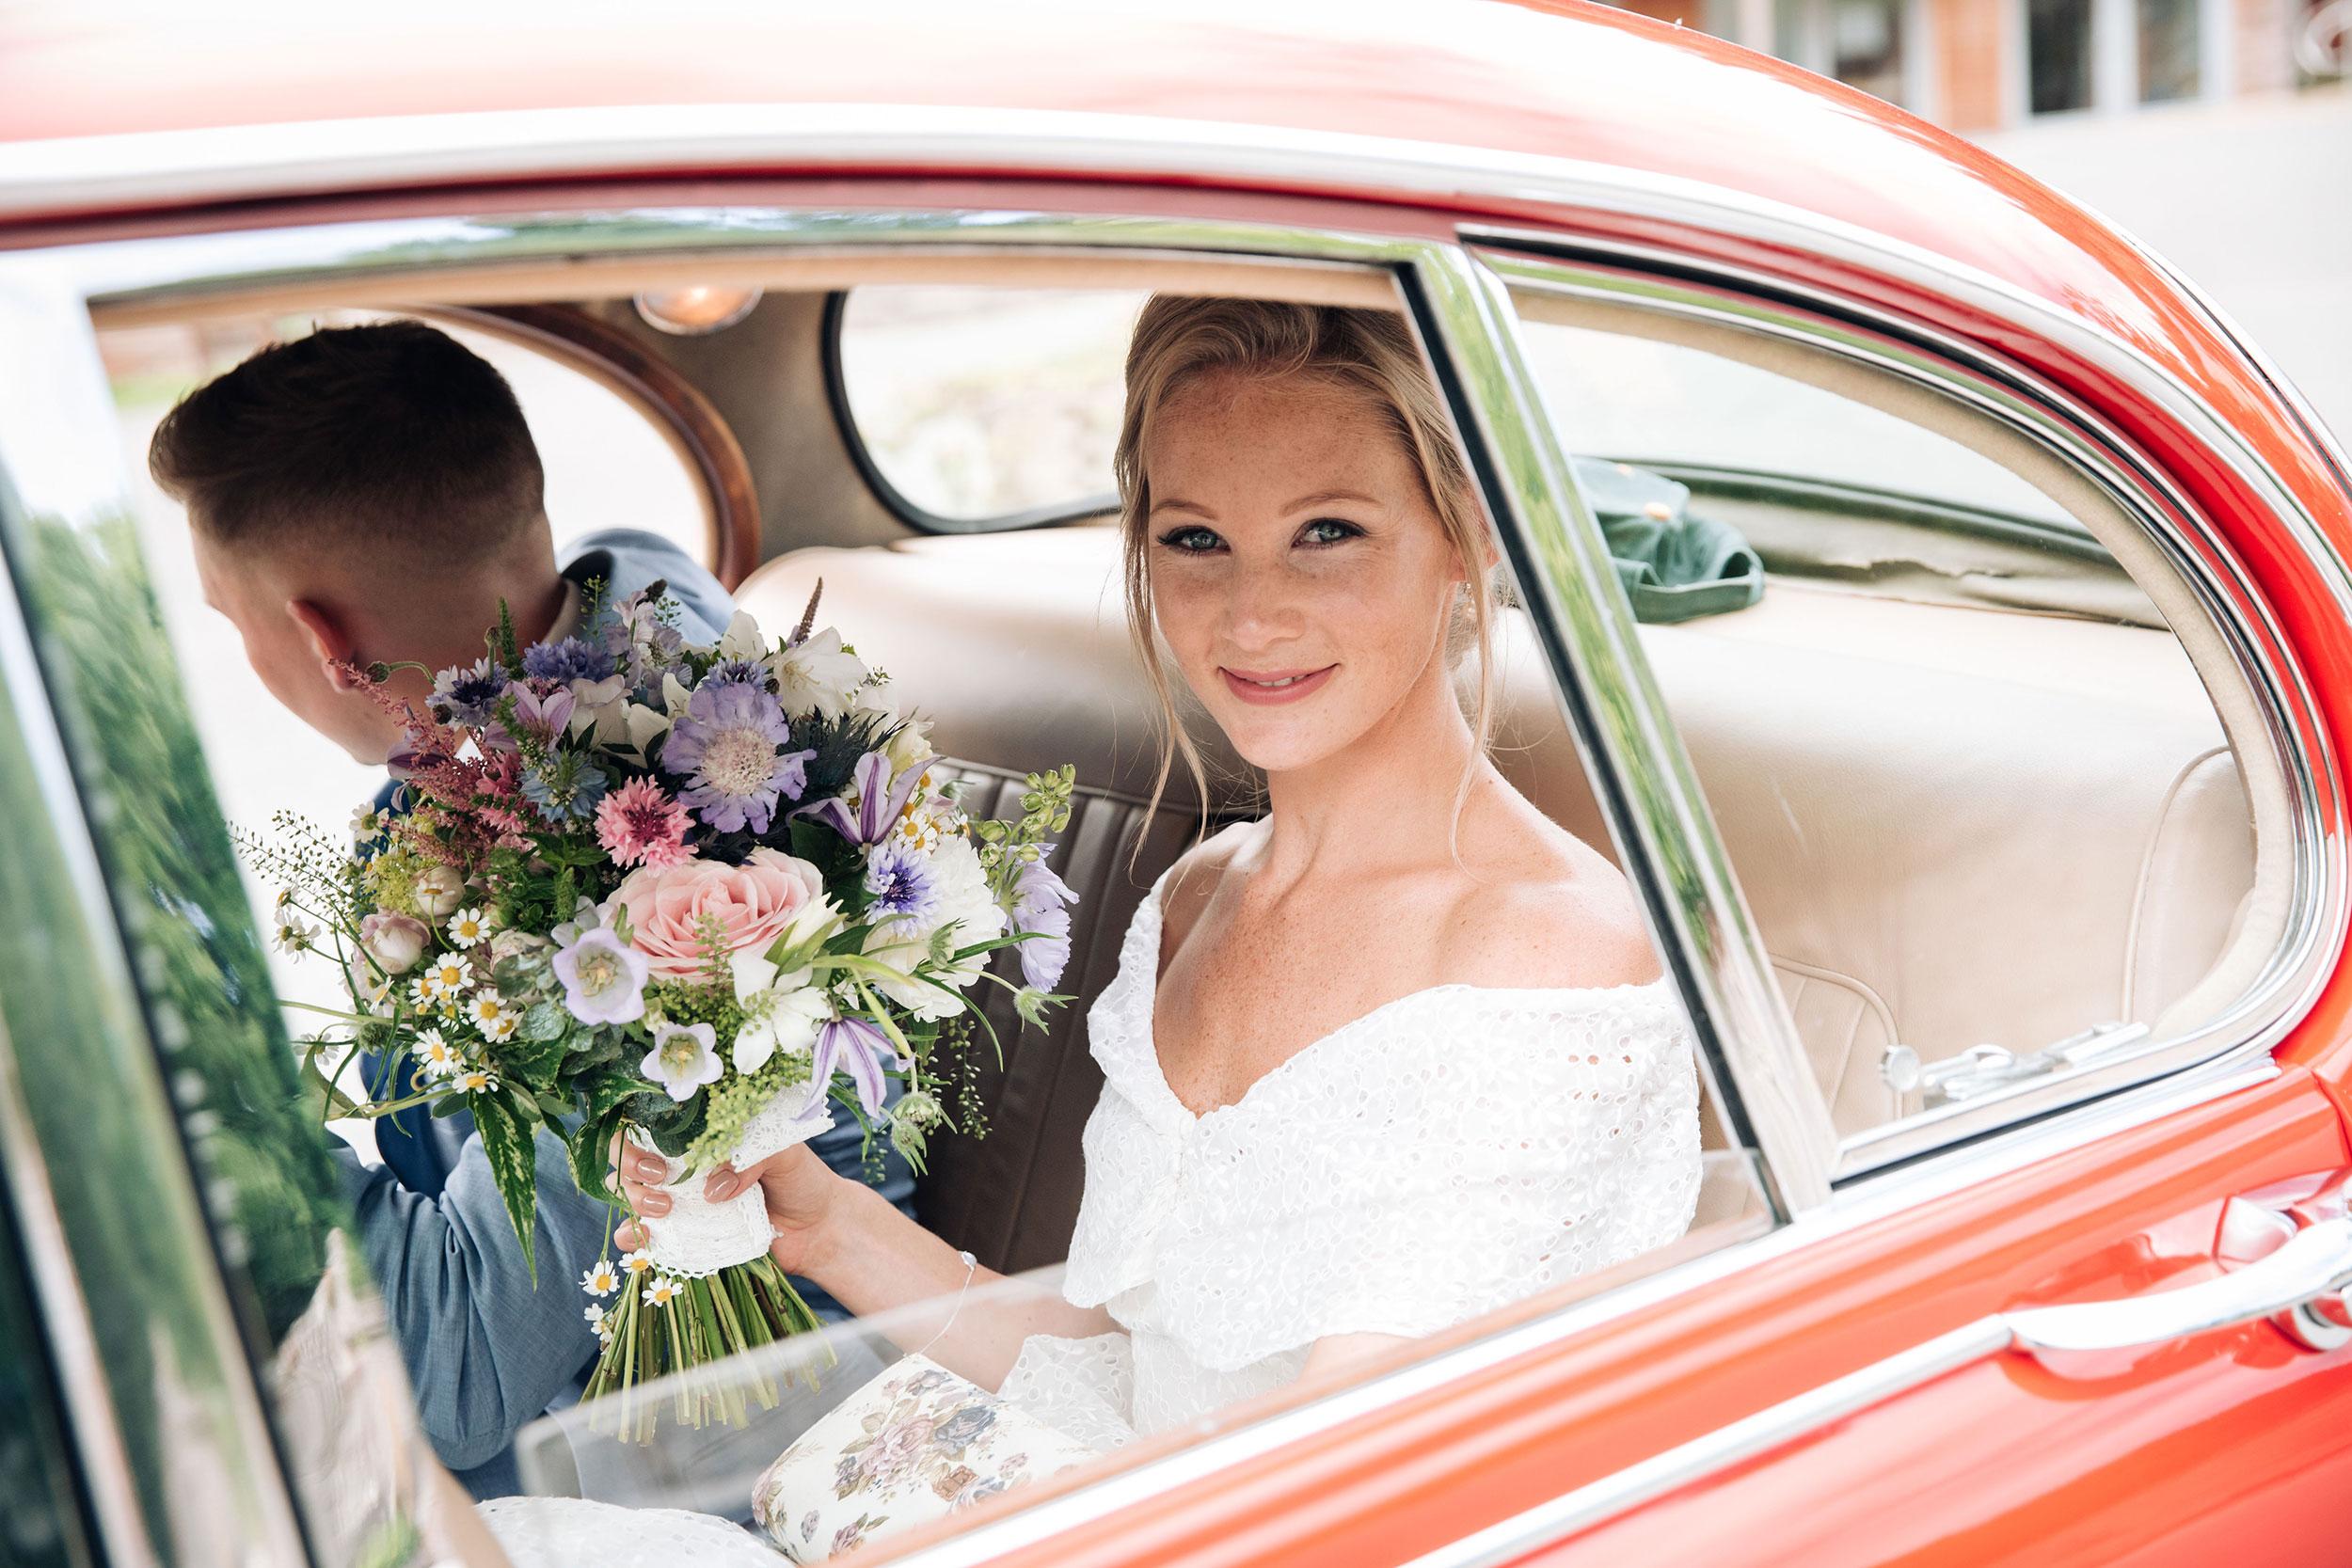 16.07.16-Tanya-&-Jethro-Wedding-Selection-12.jpg